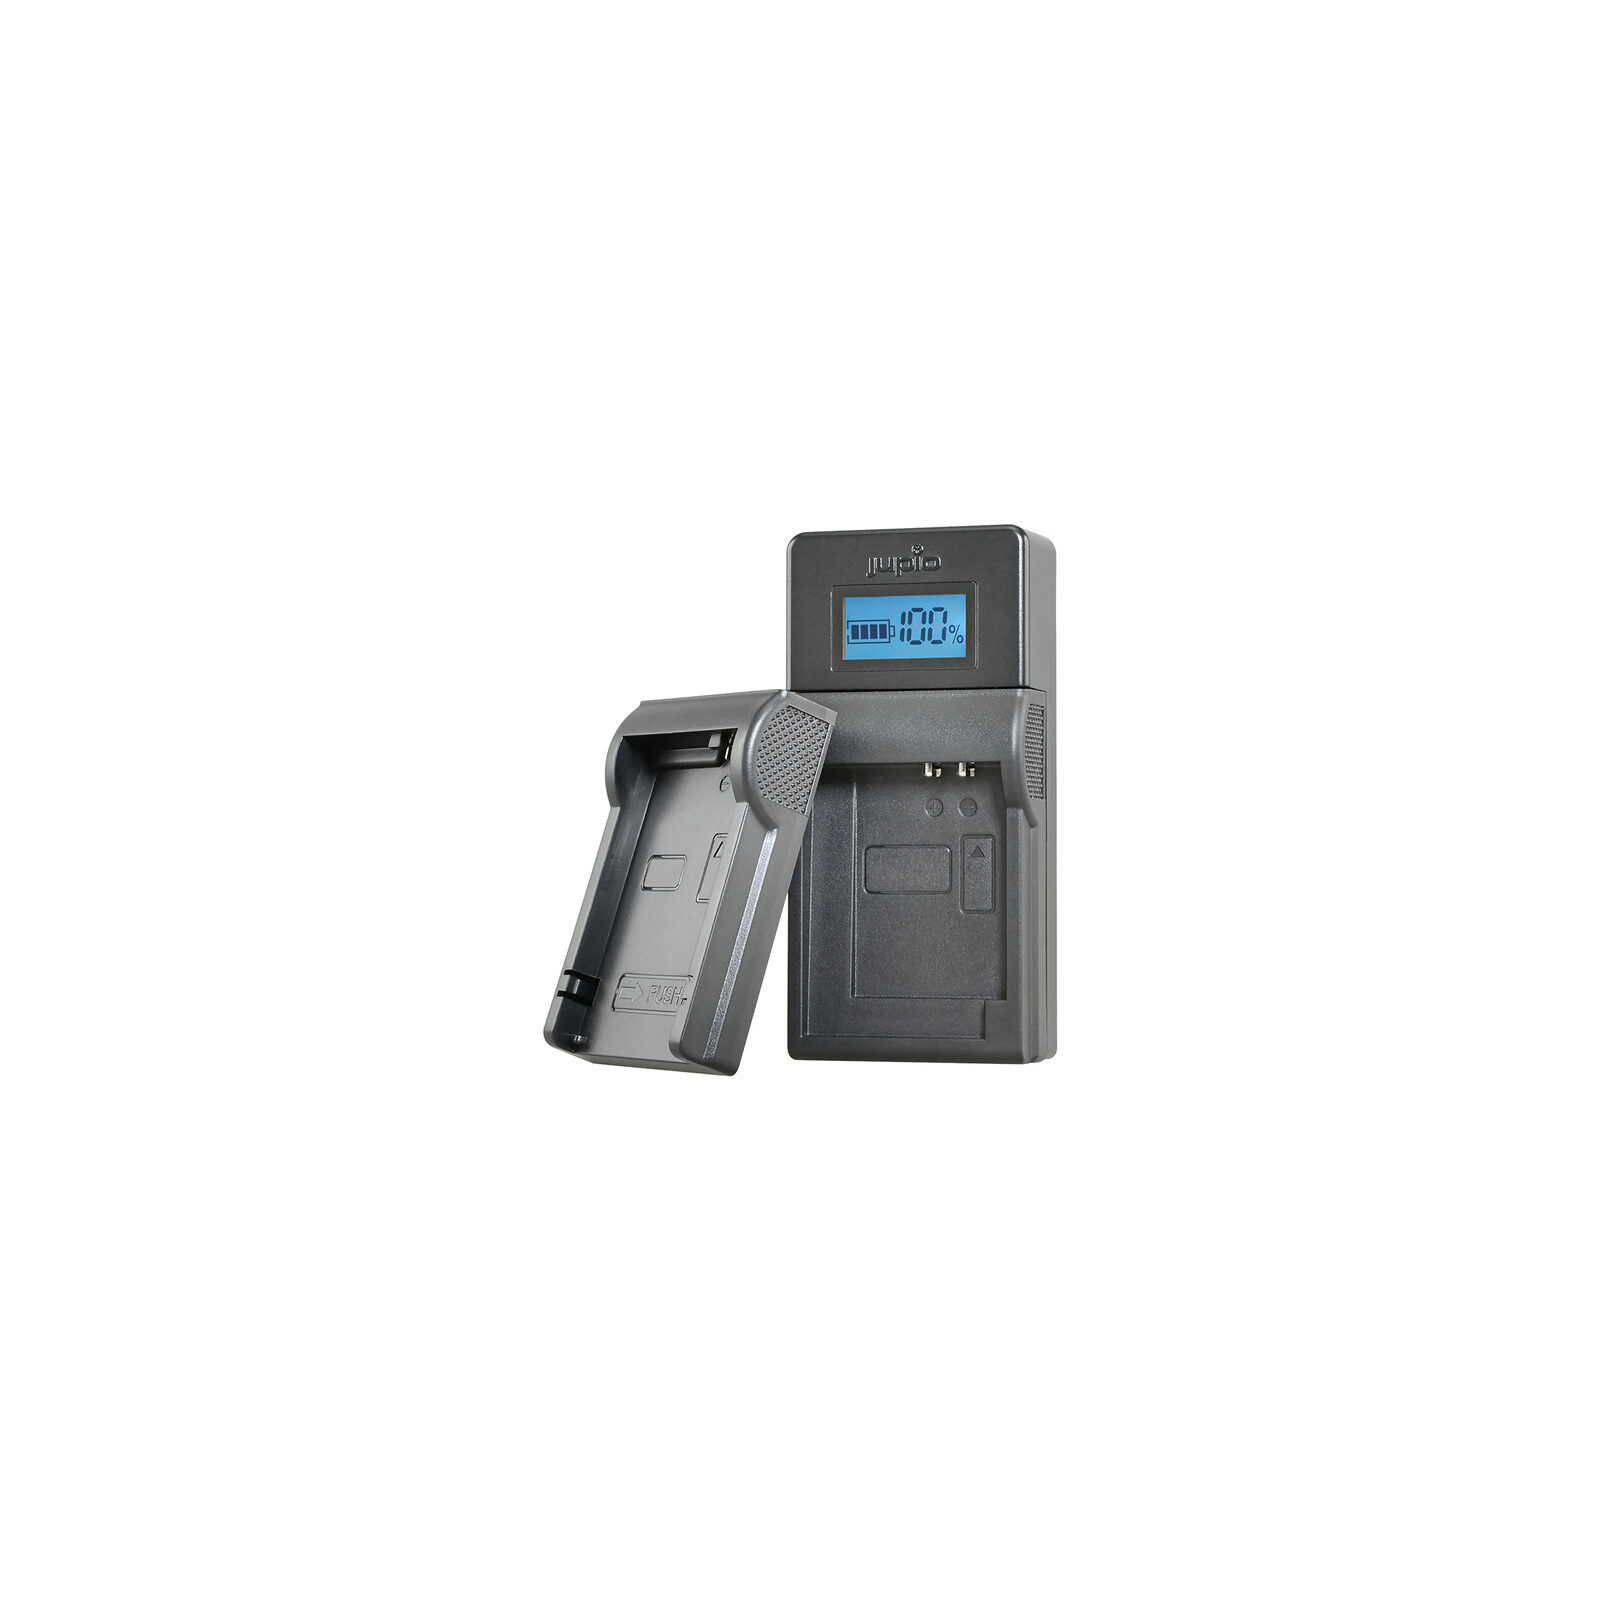 Jupio Brand Charger for Sony, Samsung, JVC 3.6-4.2V